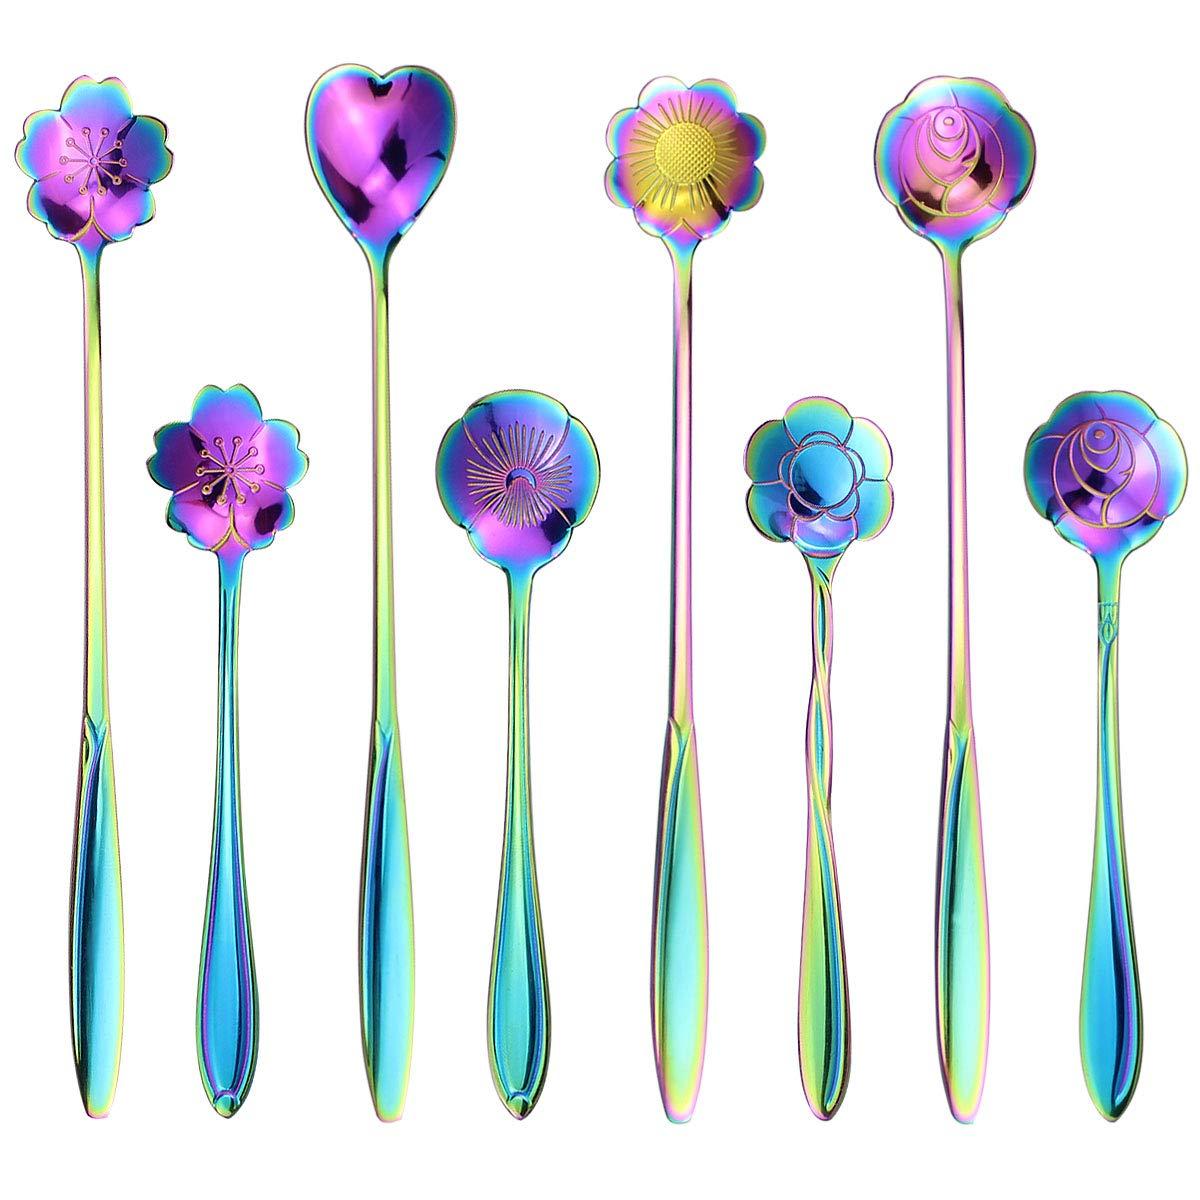 SelfTek 8Pcs Flower Spoon Set, 2 Different Size Colorful Stainless Steel Teaspoons Rainbow Coffee Stirring Spoon by SelfTek